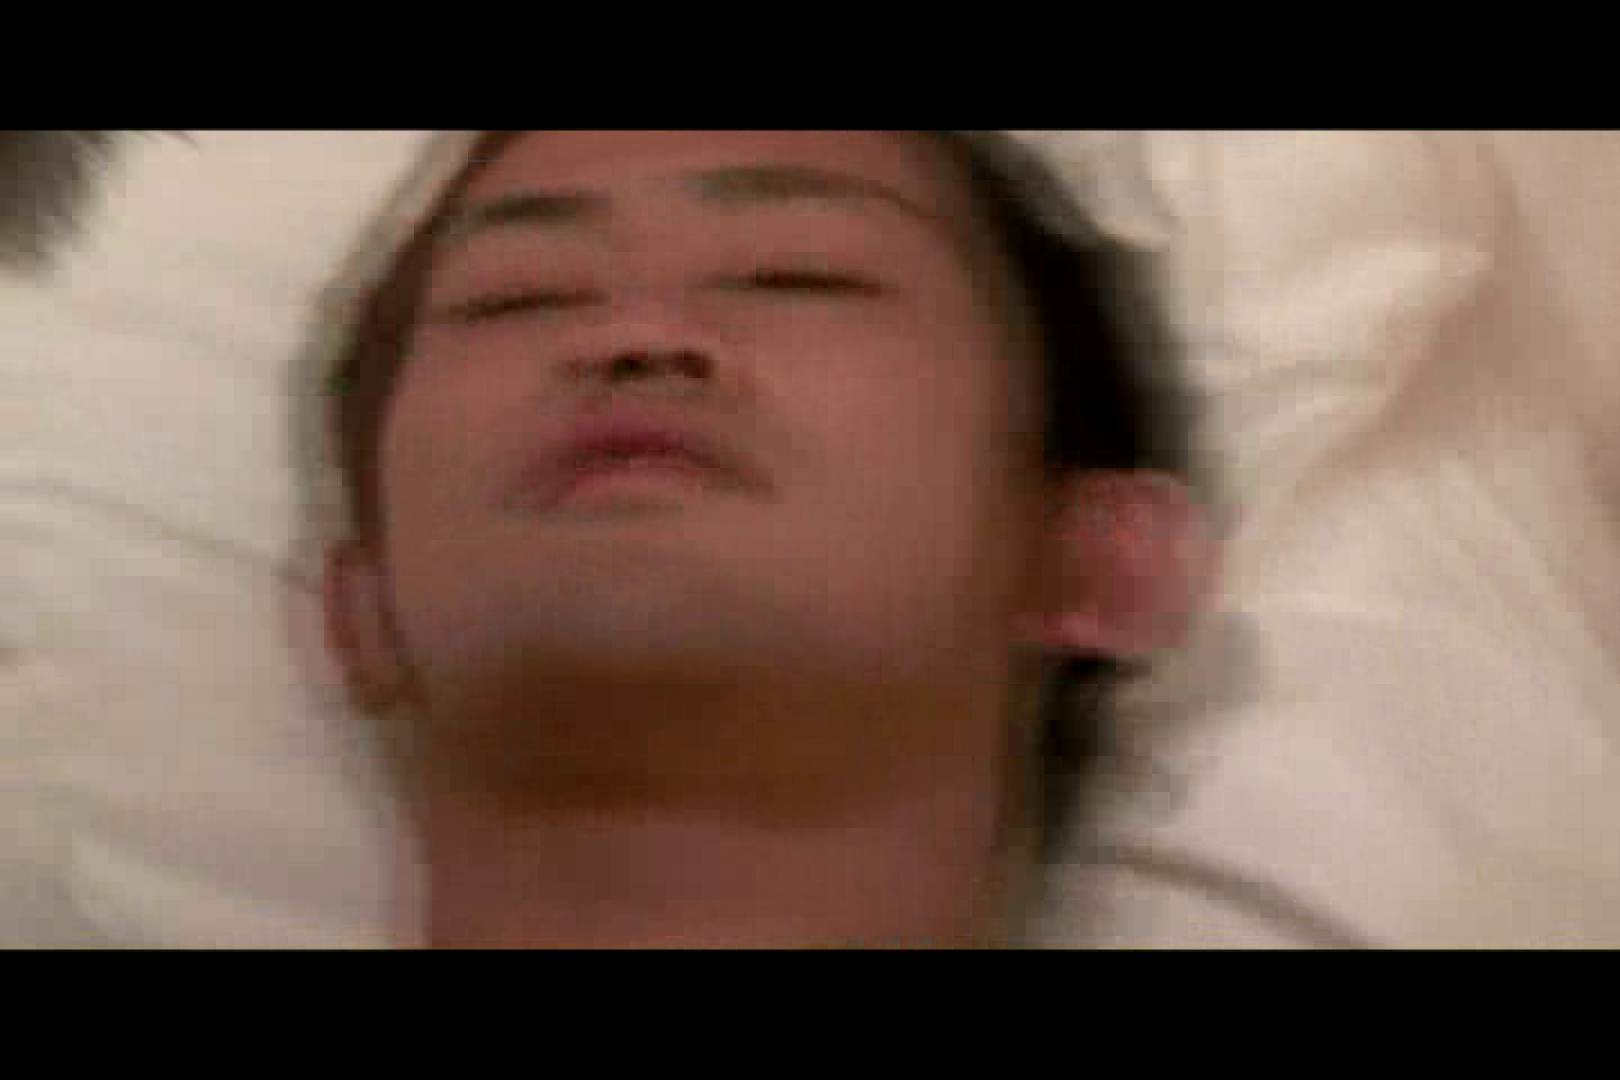 Bistro「イケメン」~Mokkori和風仕立て~vol.07 ディルド   イケメンたち  106枚 16